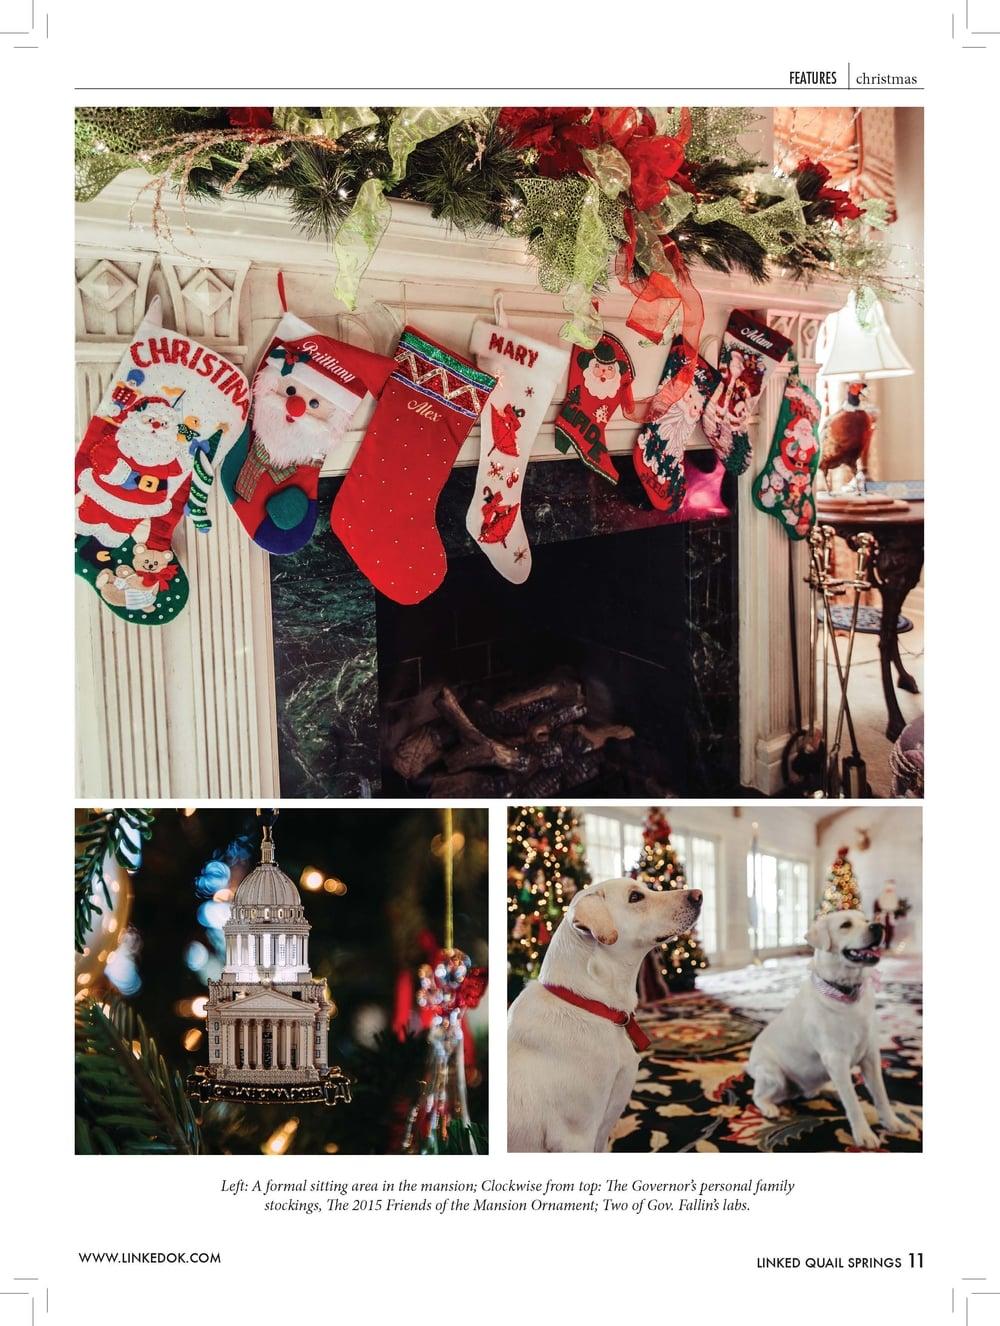 Quail Springs December FINAL_Page_11.jpg